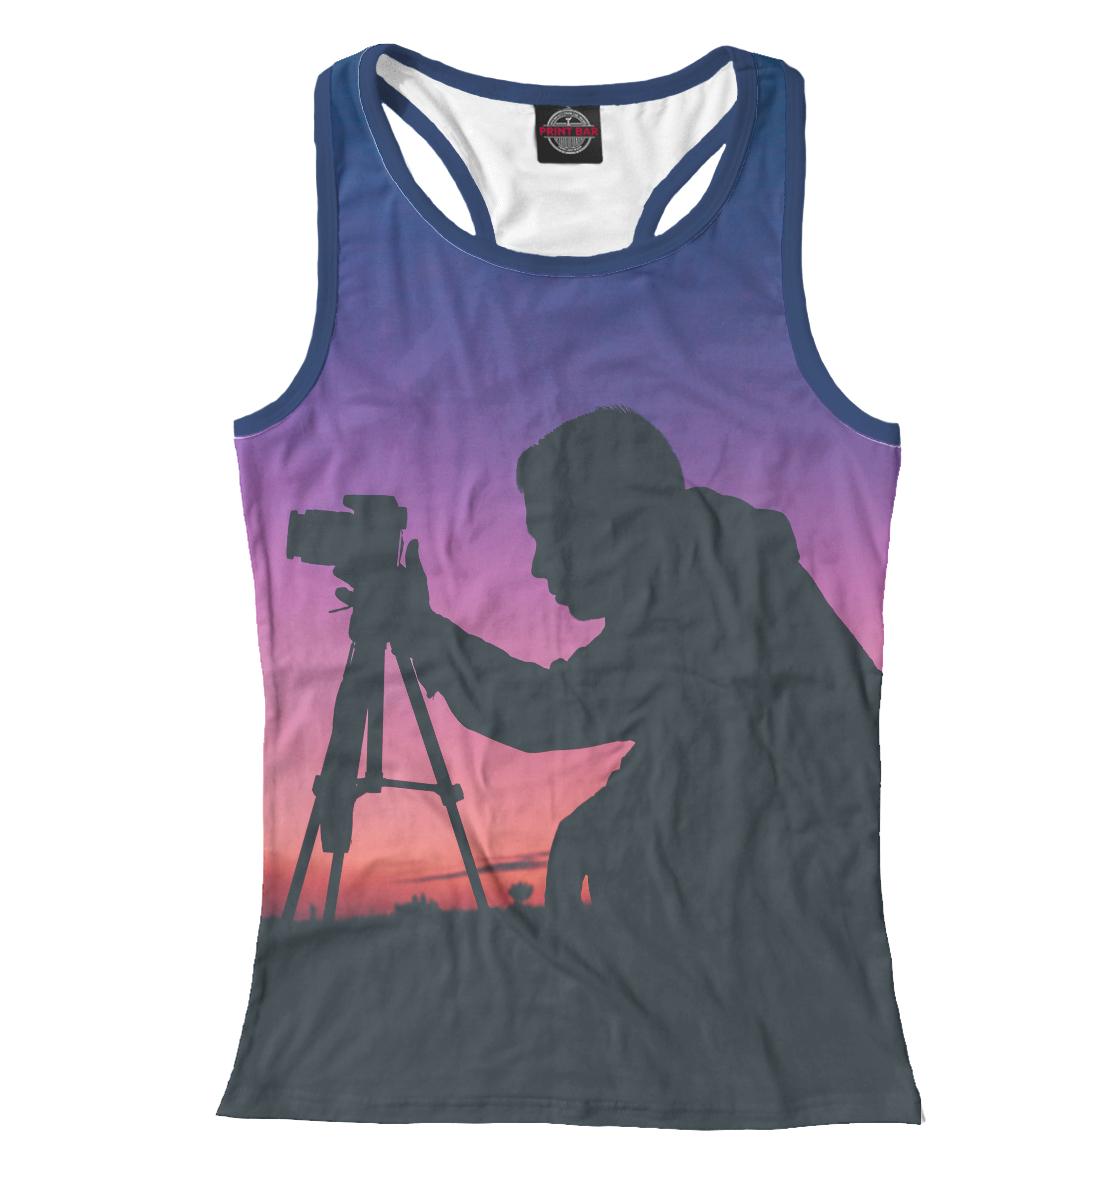 Купить Фотограф на закате, Printbar, Майки борцовки, PTG-699780-mayb-1